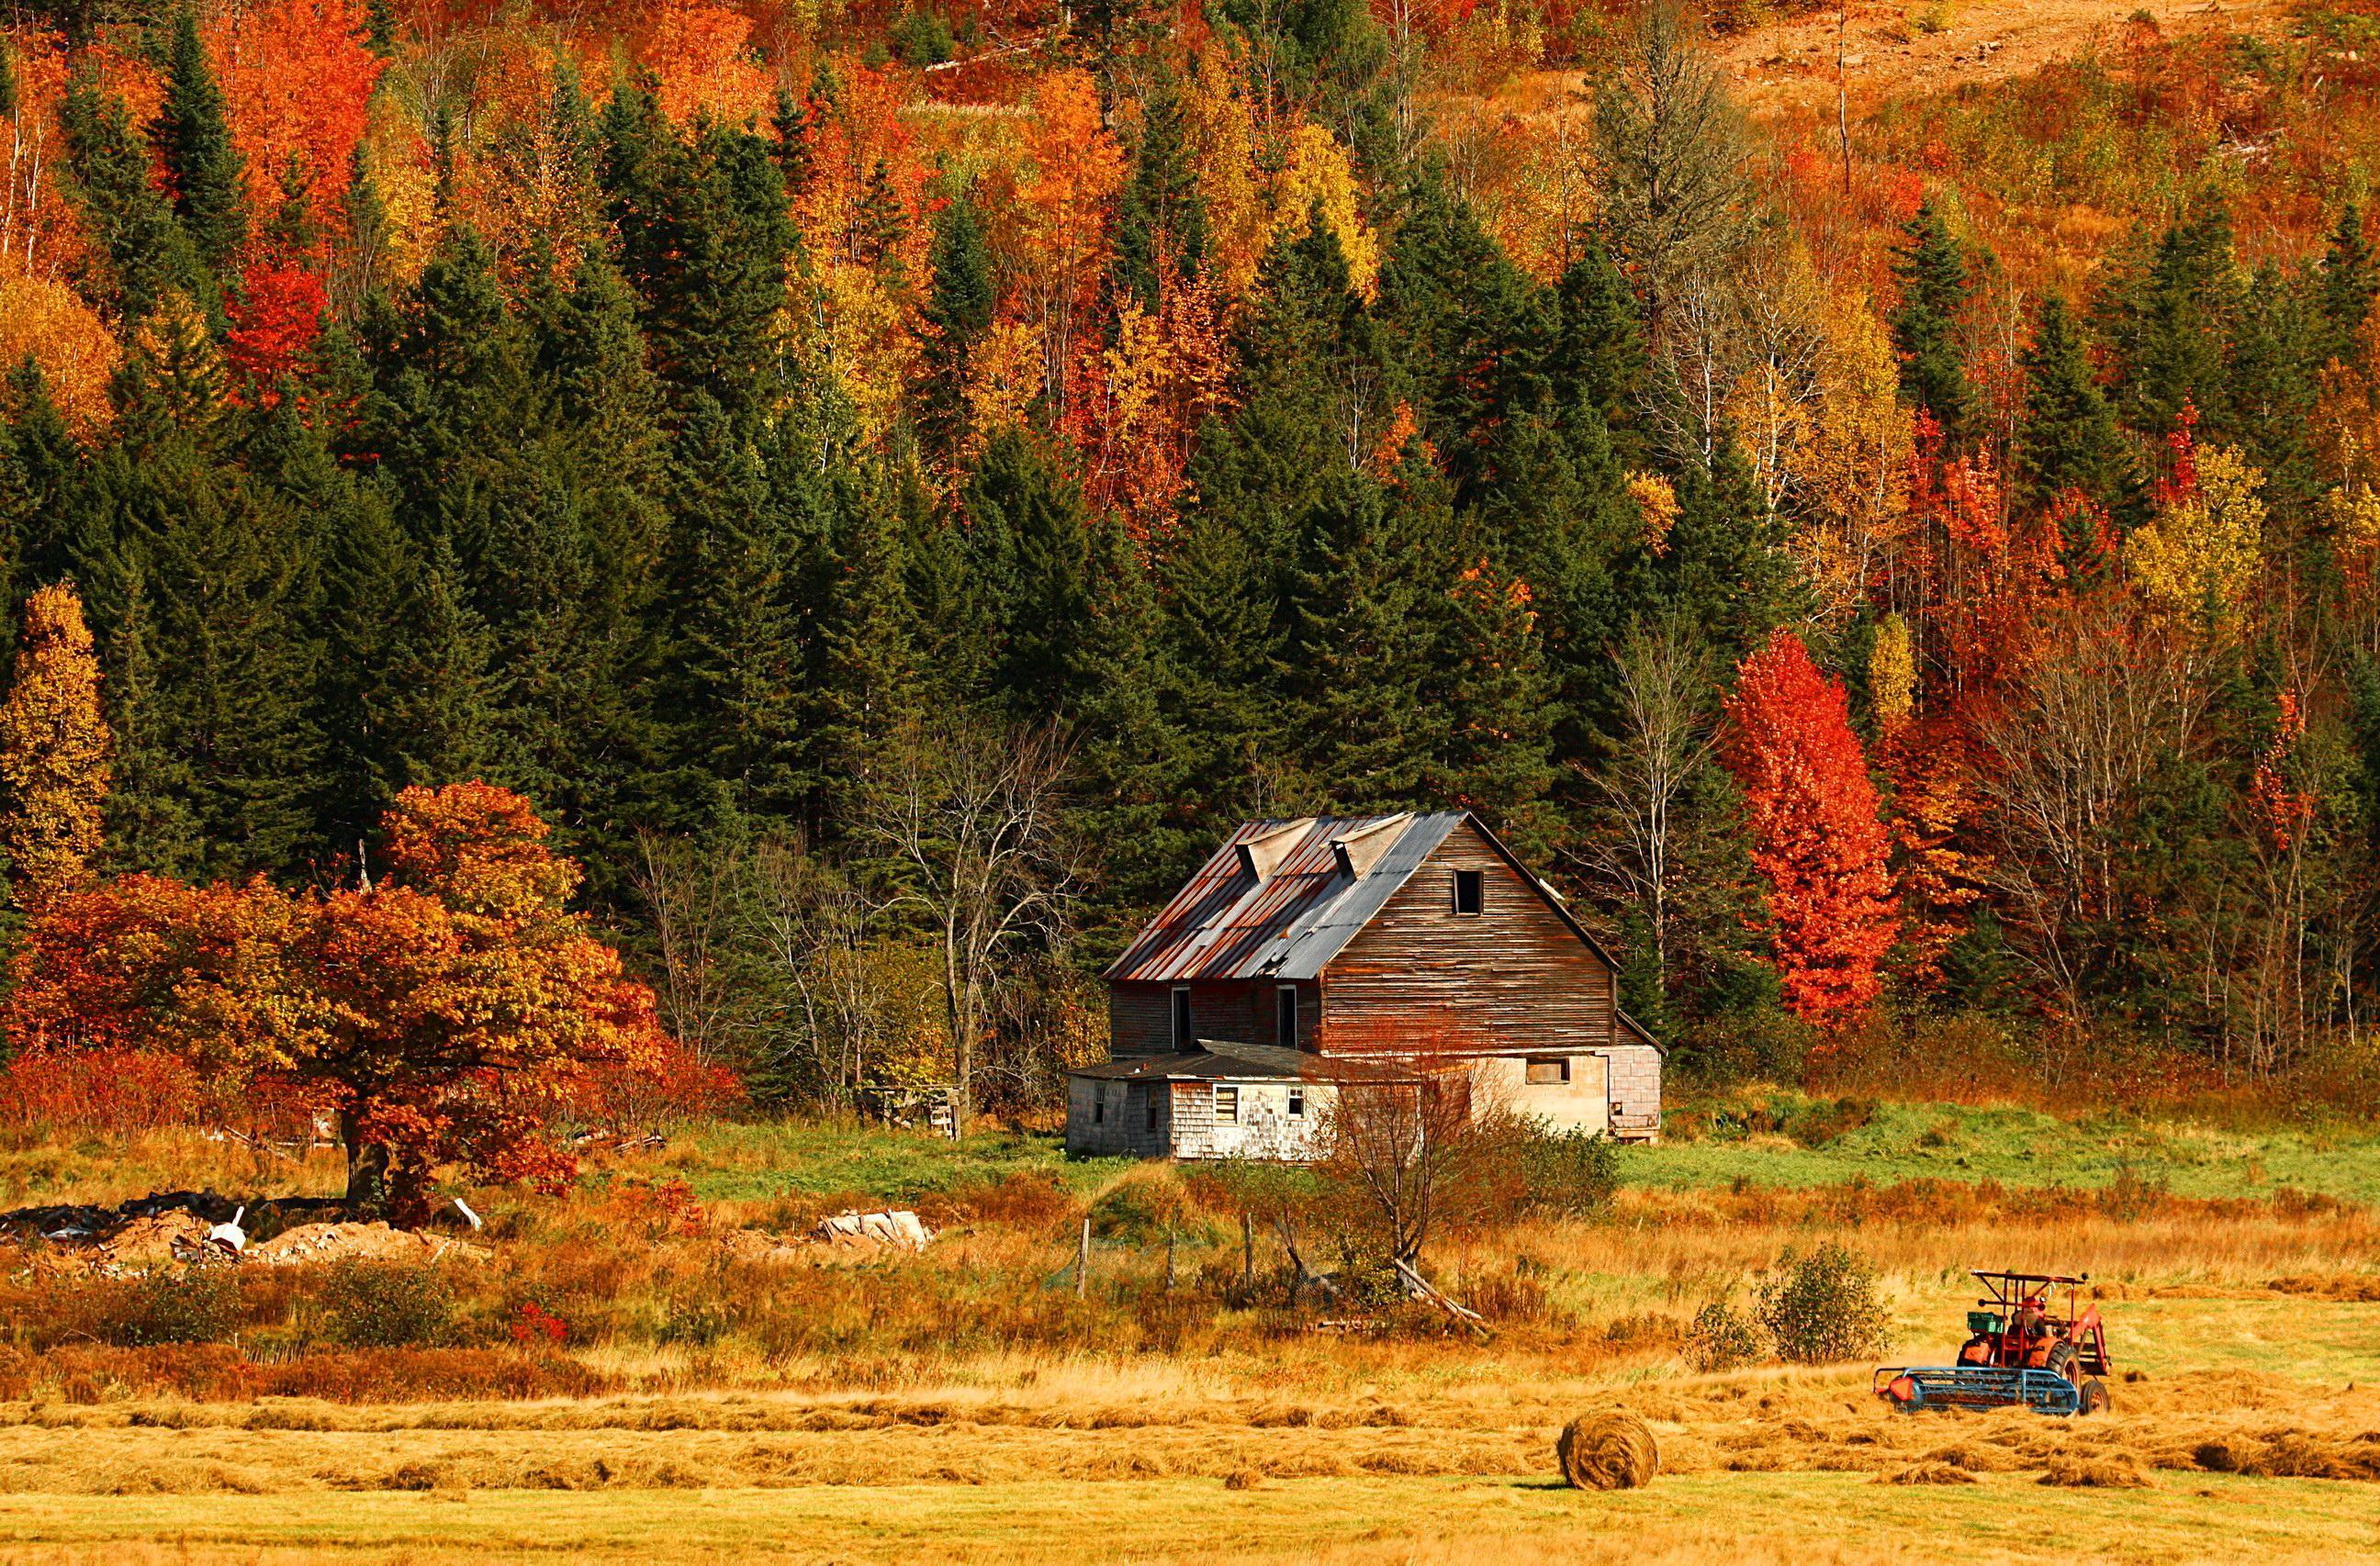 Autumn Mountains Backgrounds On Hd 2592x1706 Free Mountain Autumn Wallpapers Wallpapersafari